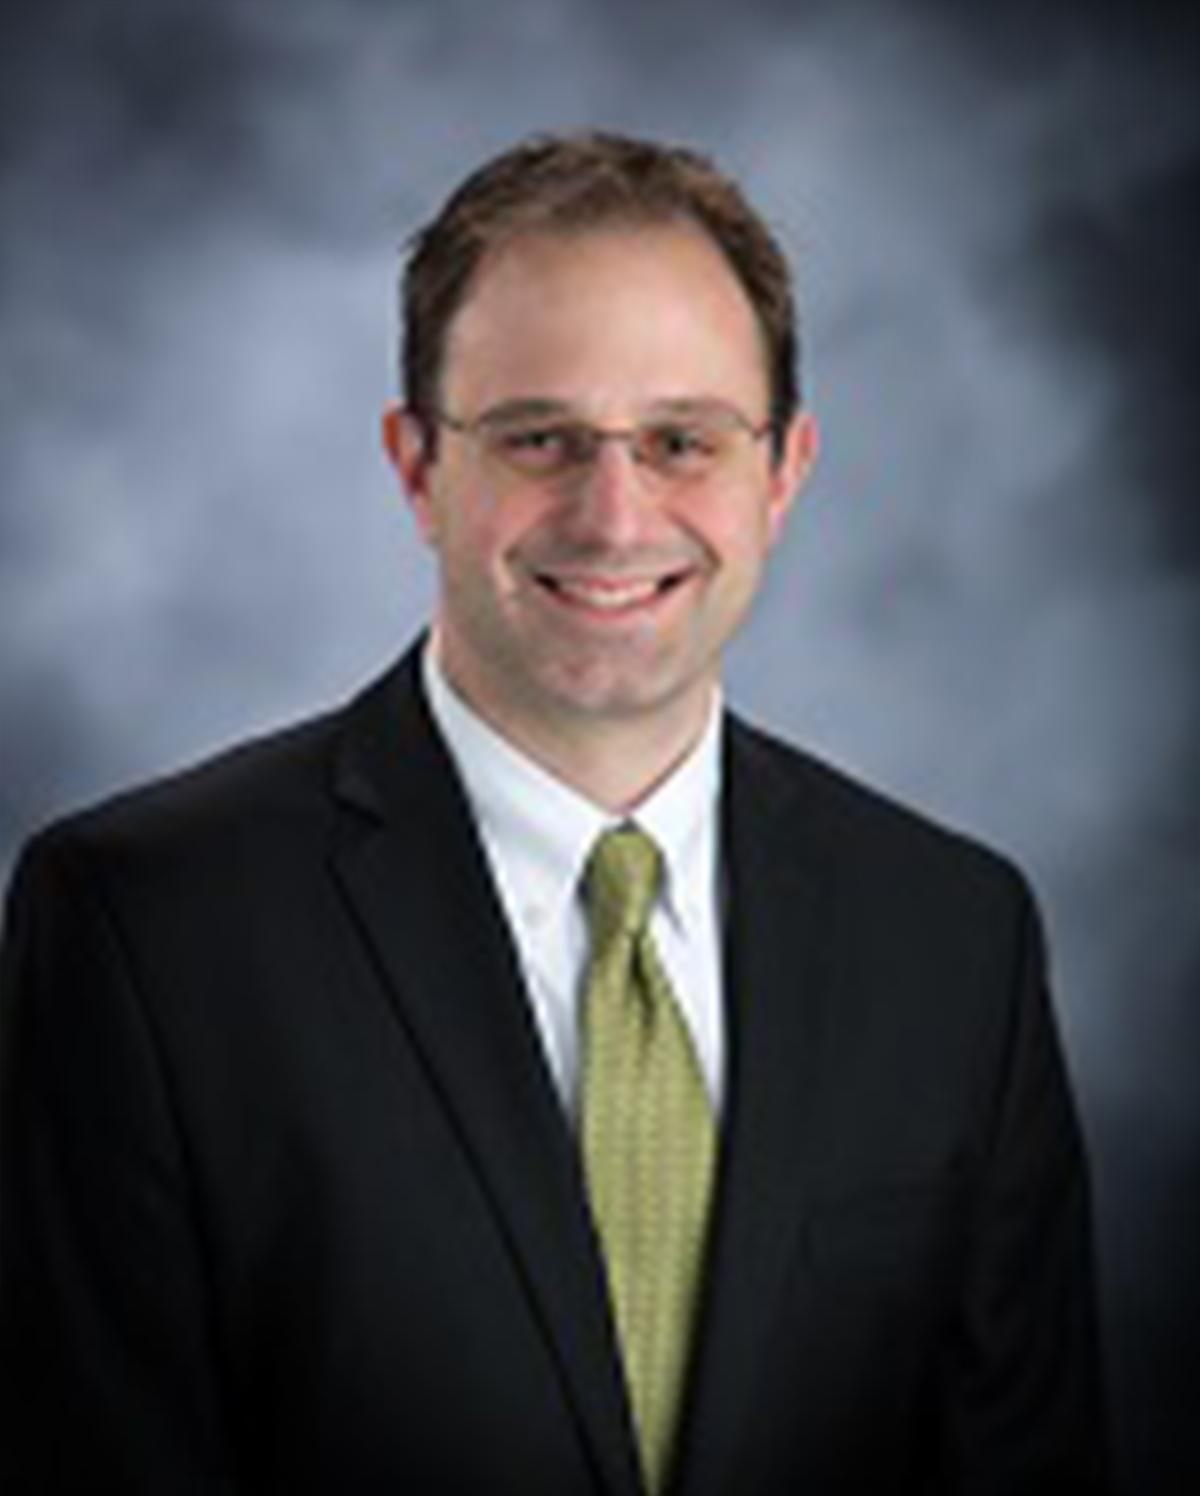 Christopher M. Bedient, CFA